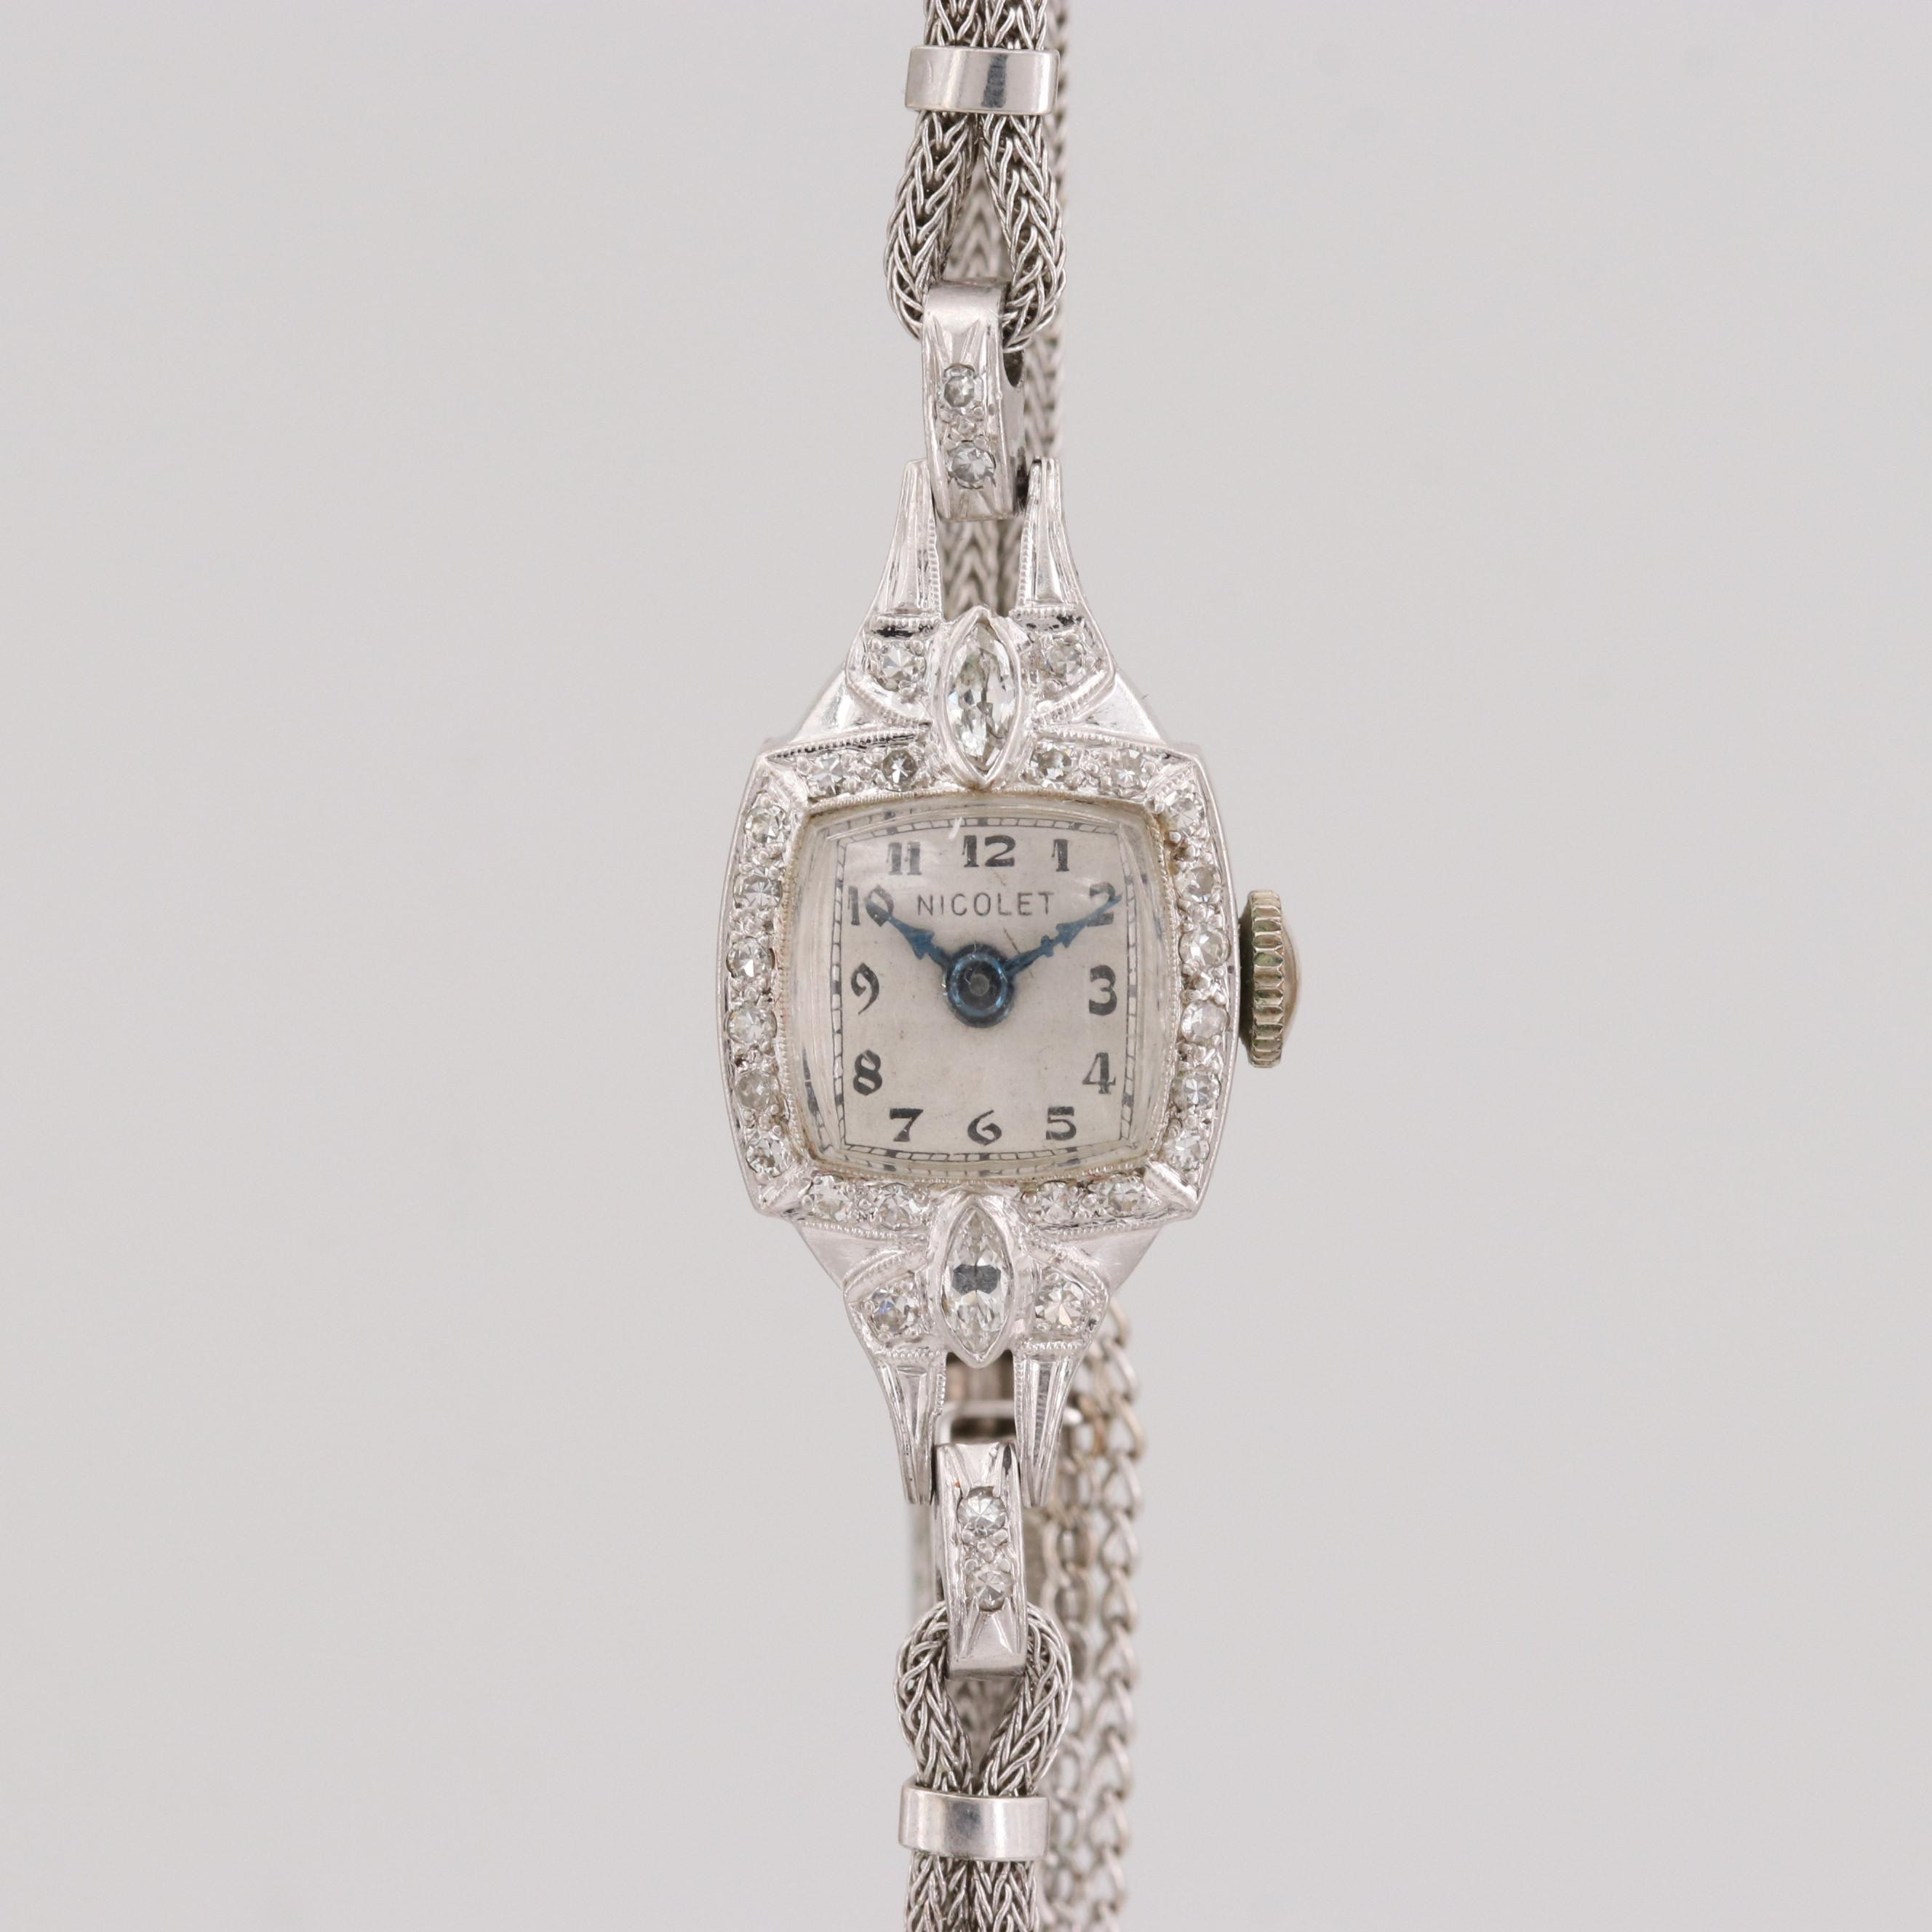 Vintage Nicolet Platinum Diamond Stem Wind Wristwatch